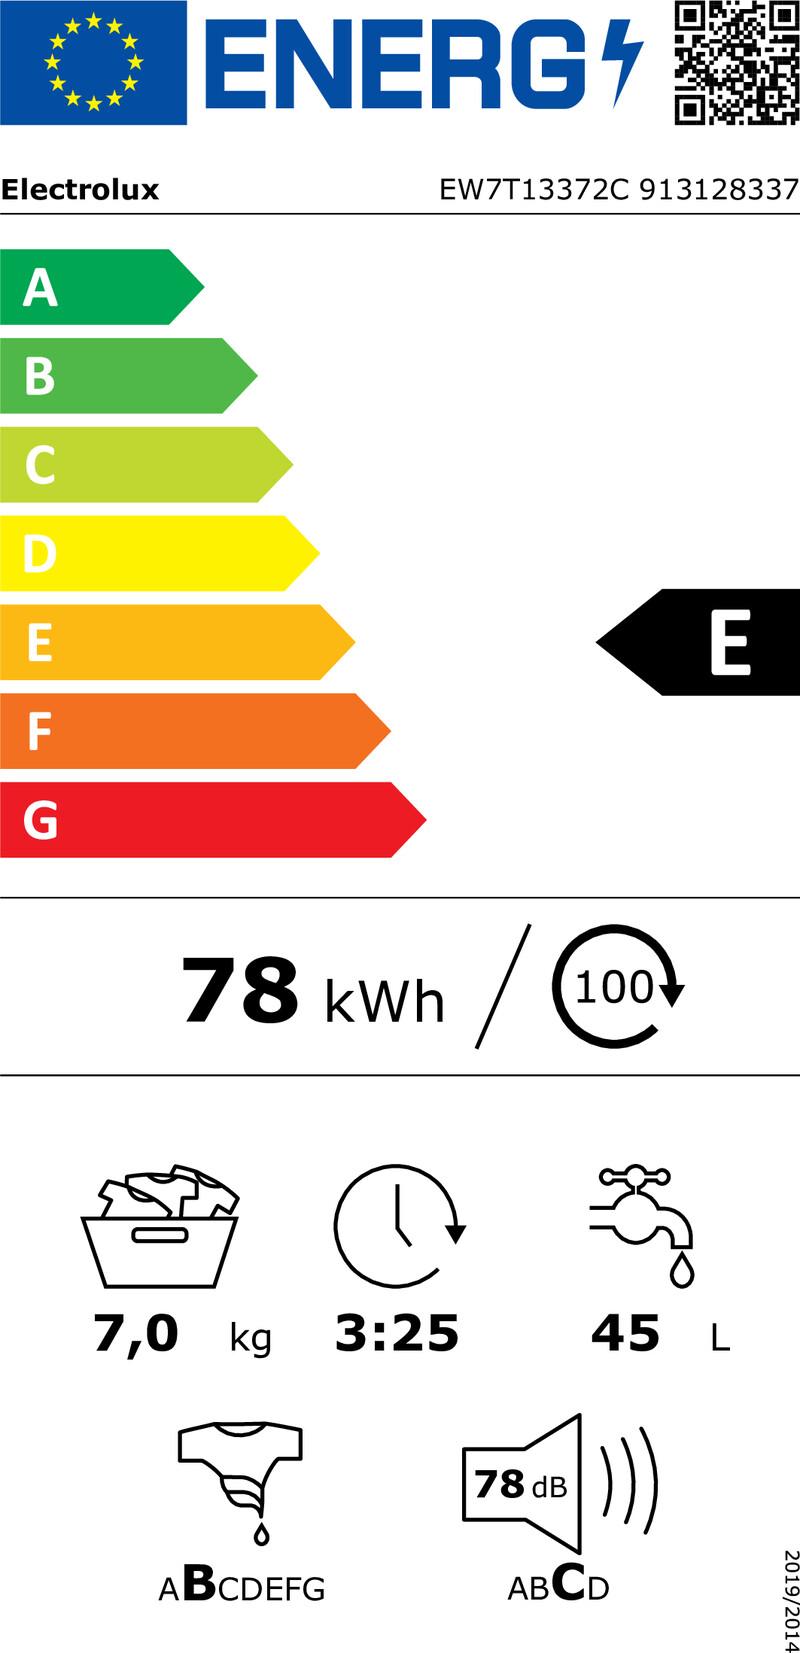 Energetický štítek Electrolux EW7T13372C